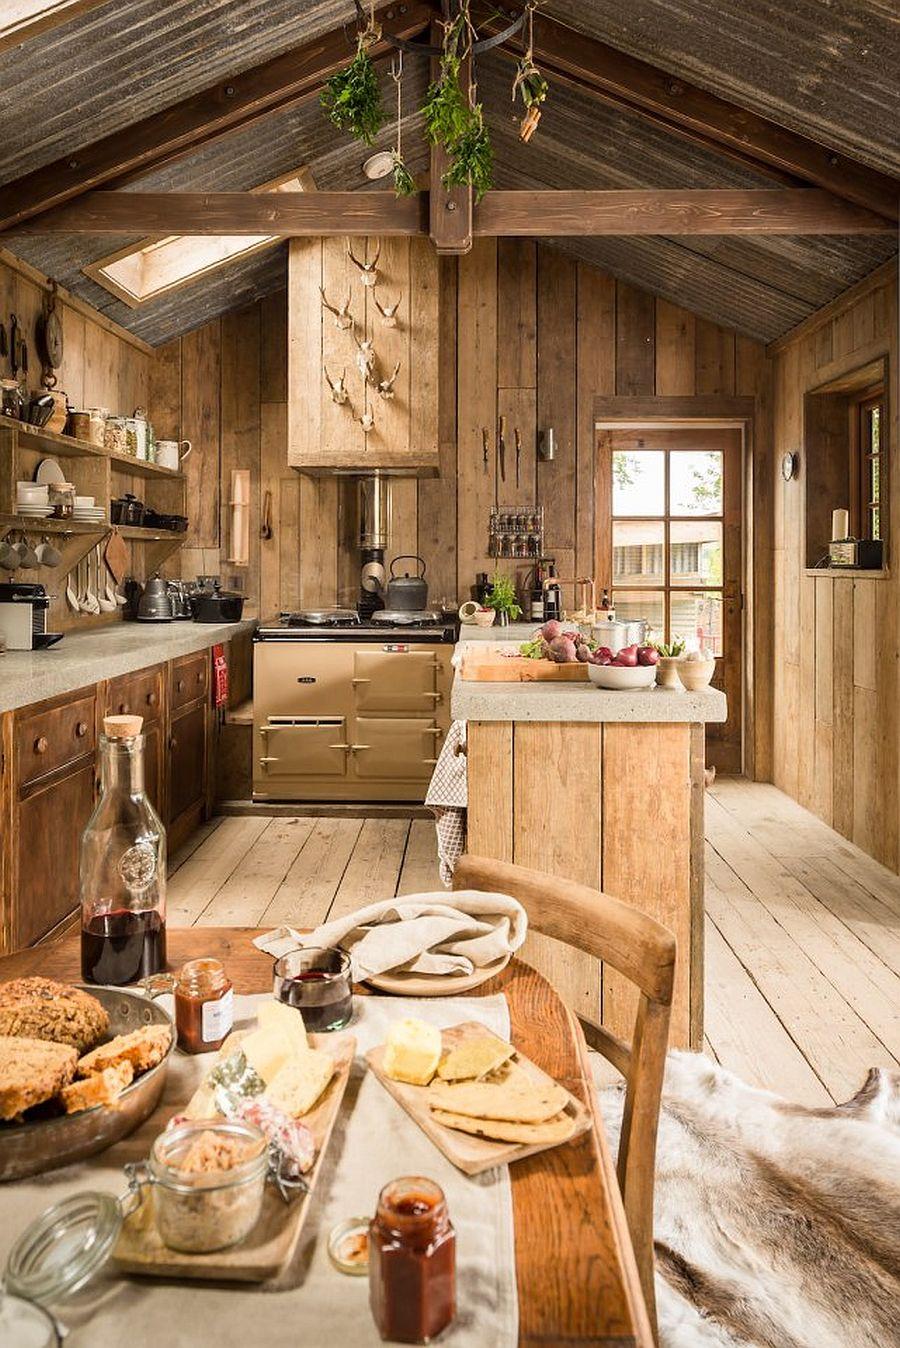 de poveste acest refugiu rustic o caban armant din lemn cu teras i gr din adela p rvu. Black Bedroom Furniture Sets. Home Design Ideas